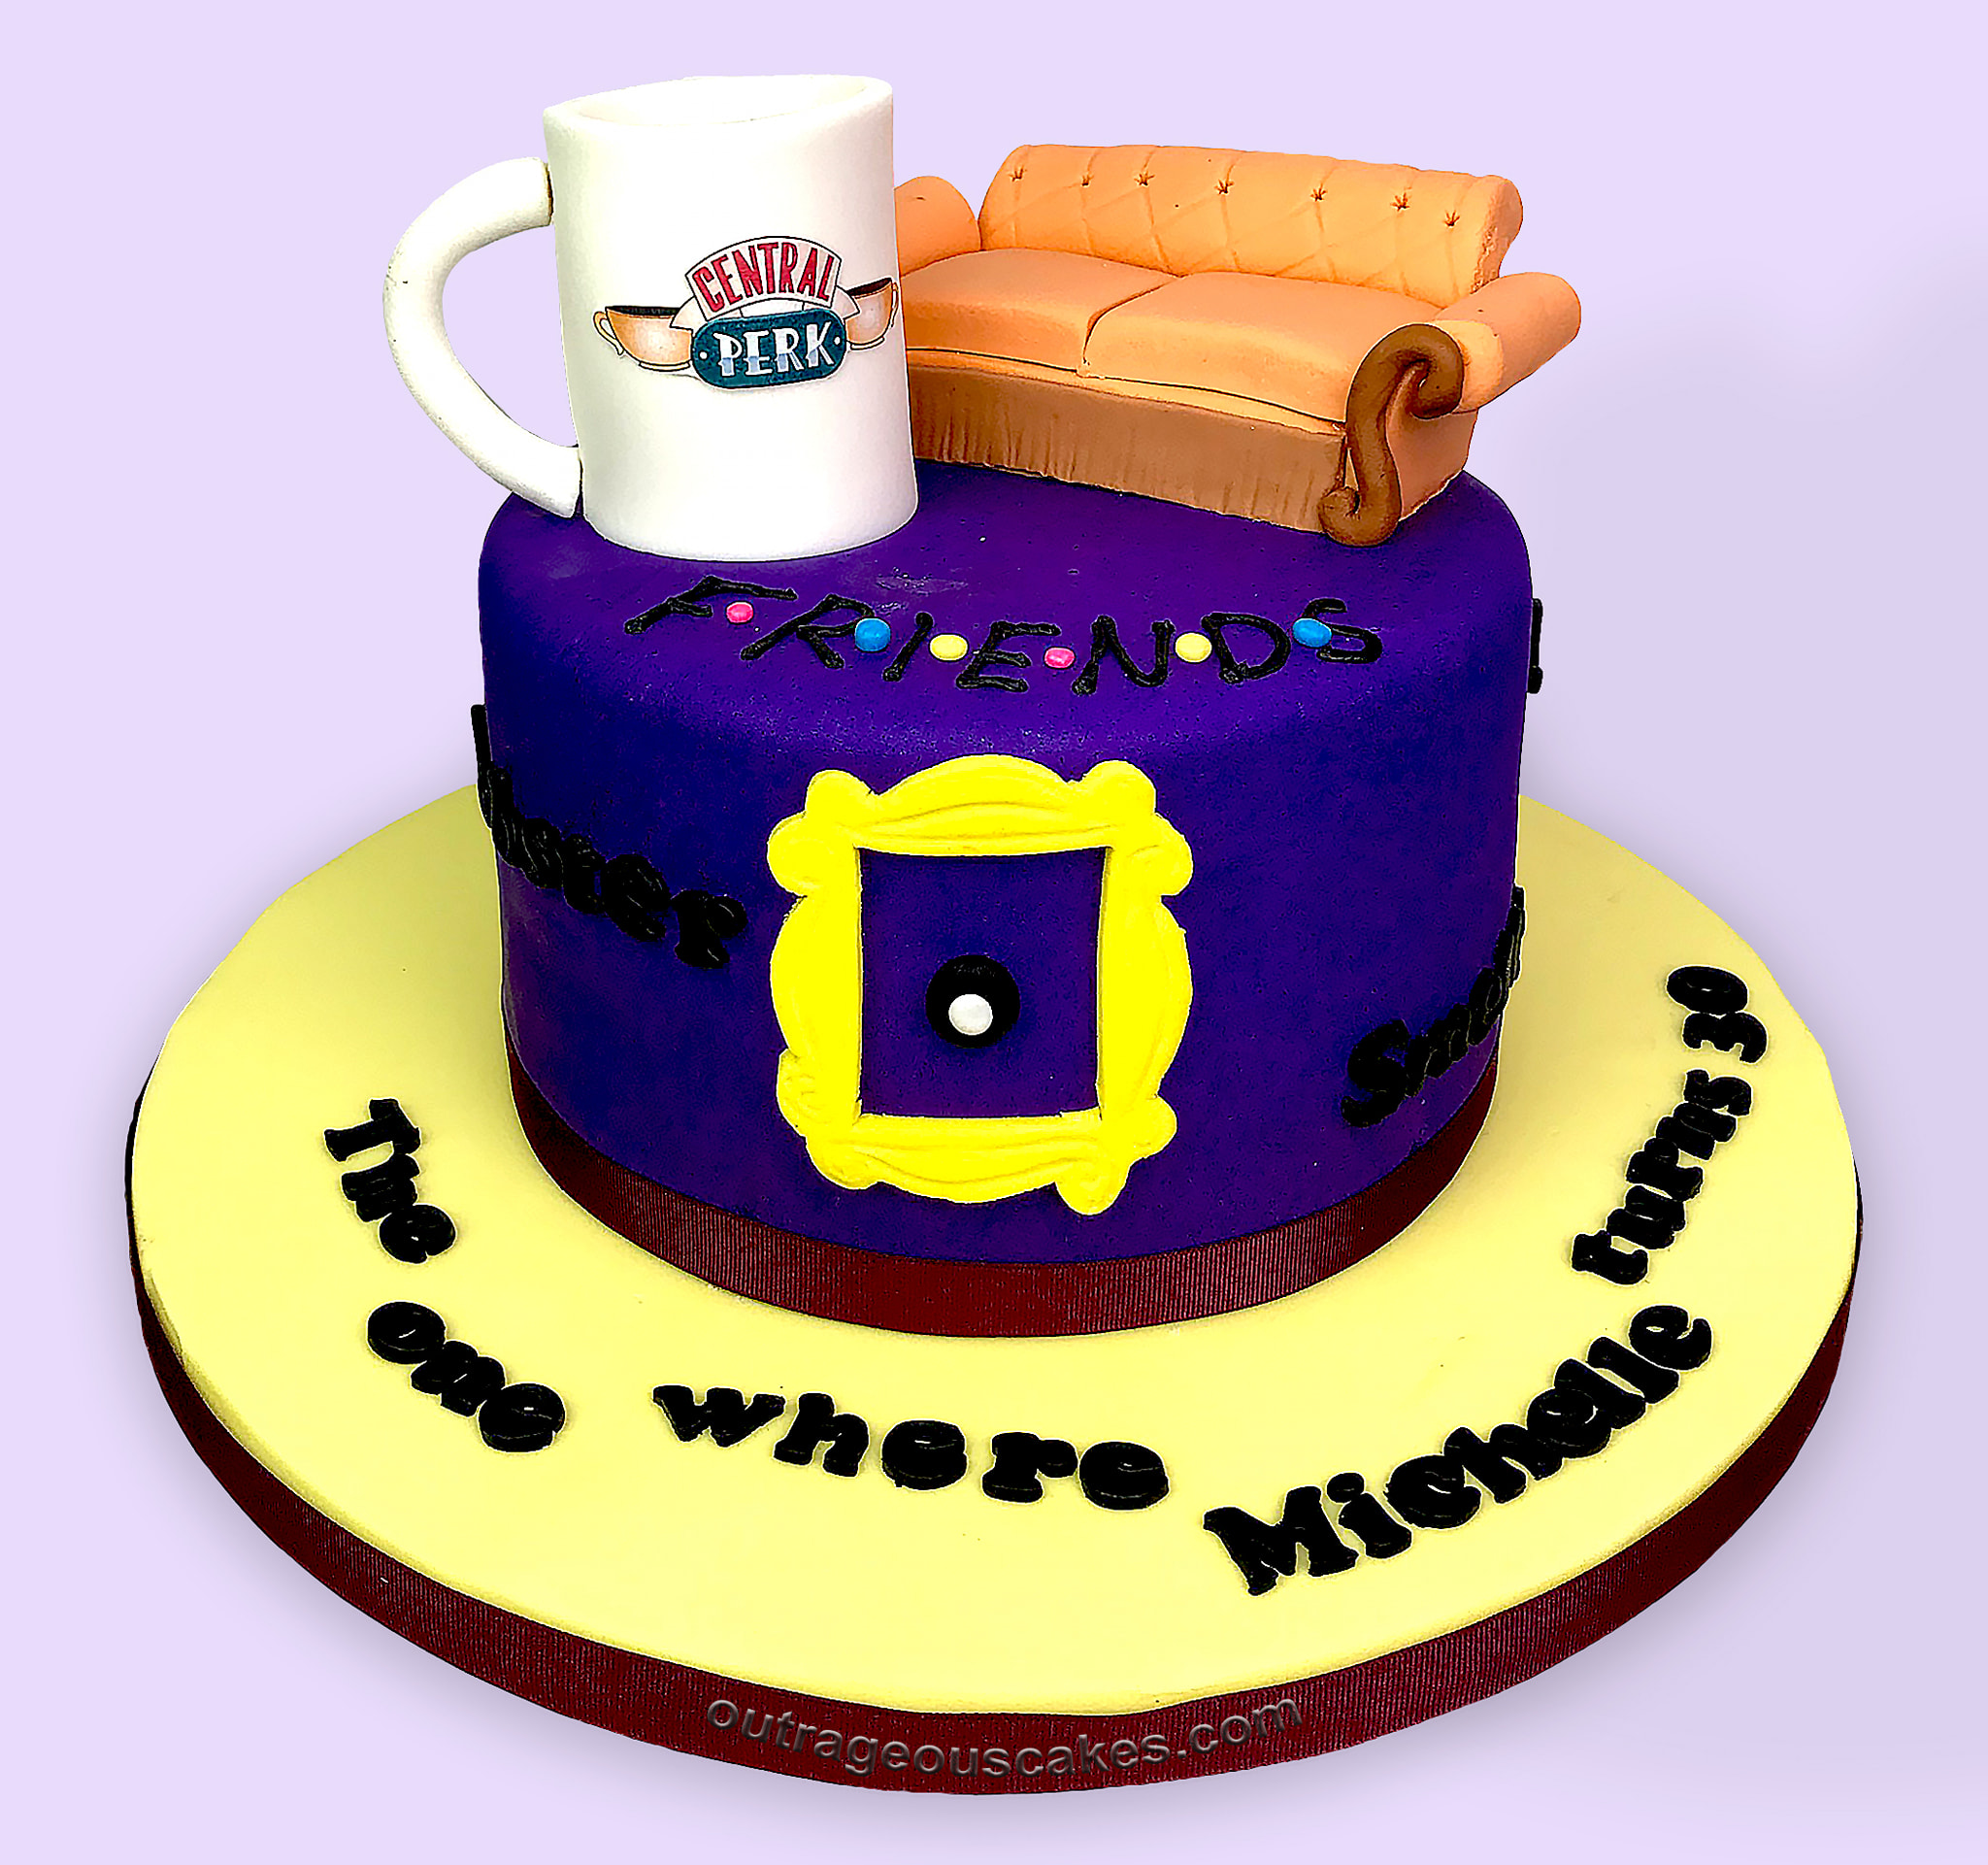 Friend's Cake